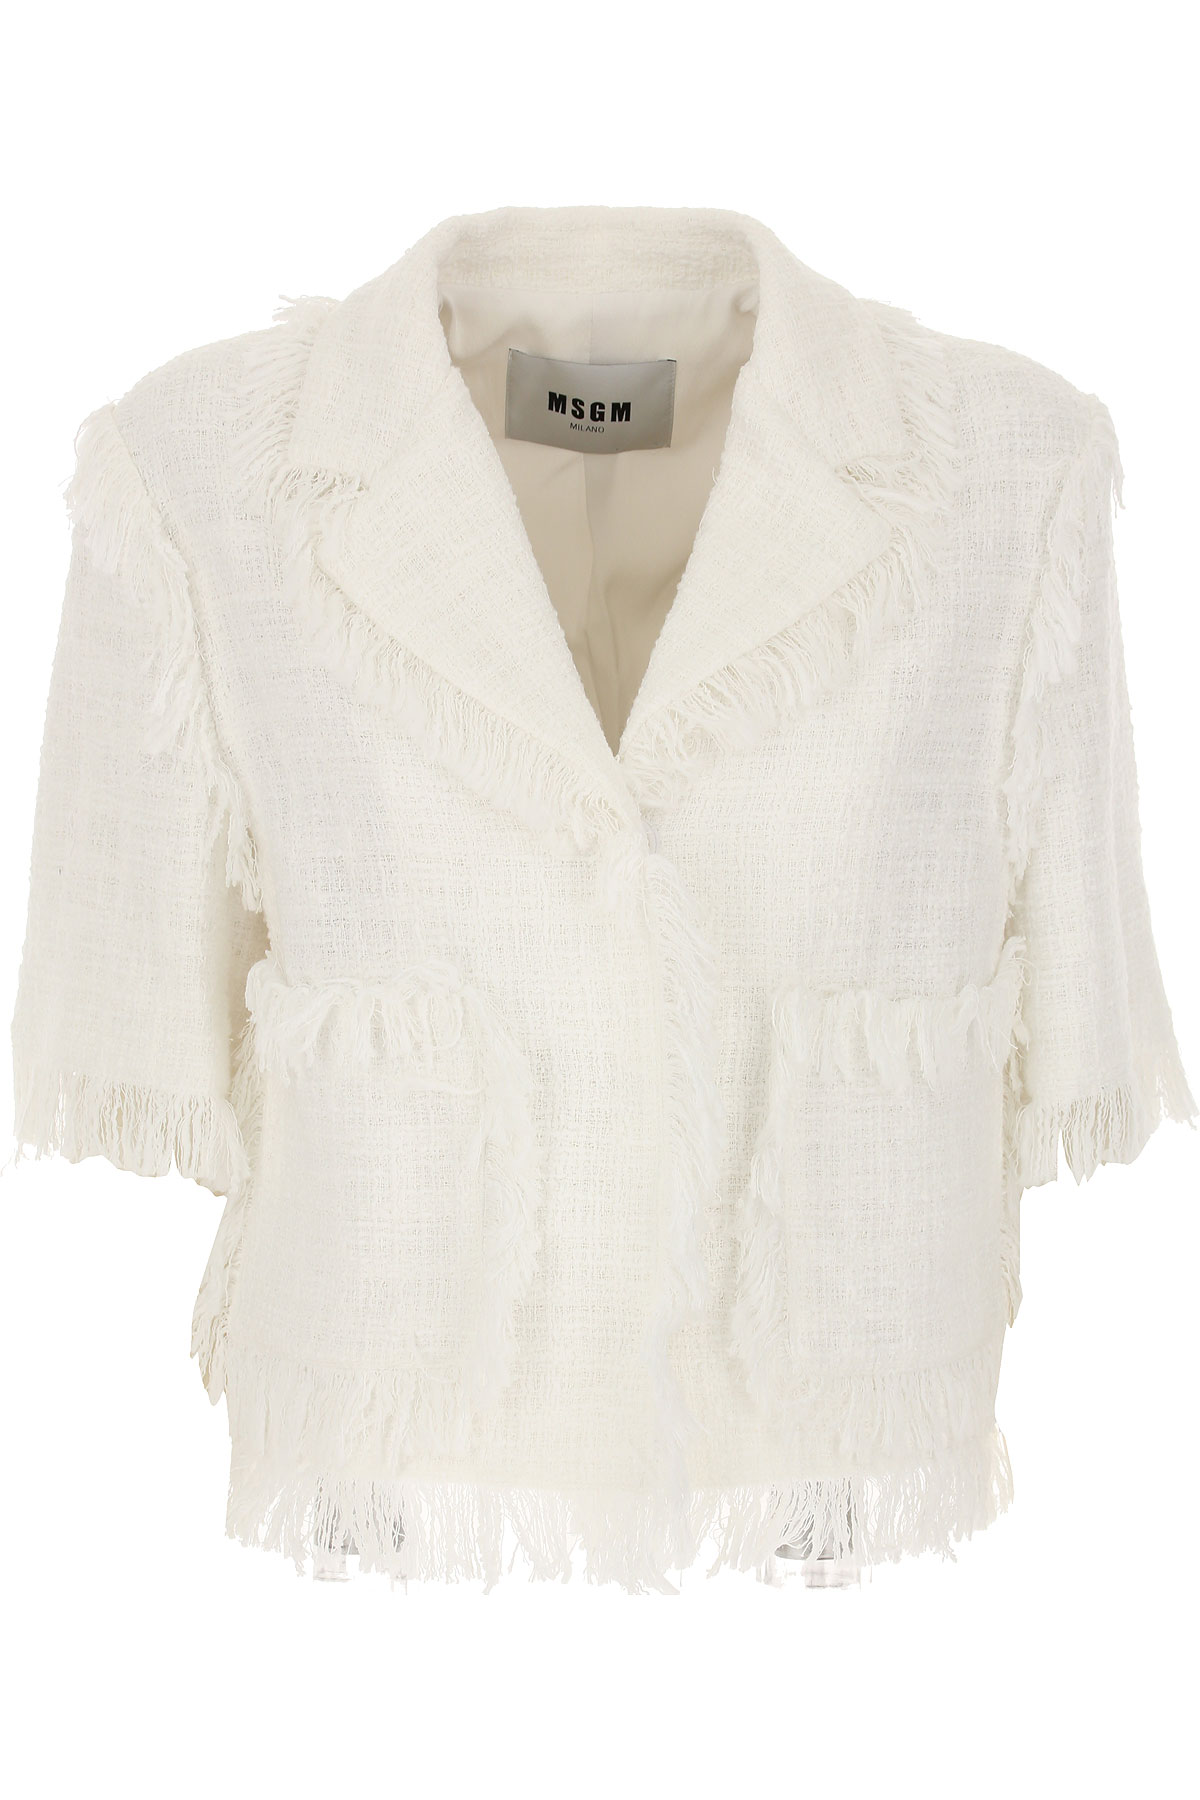 Image of MSGM Blazer for Women, White, Cotton, 2017, UK 8 - US 6 - EU 40 UK 10 - US 8 - EU 42